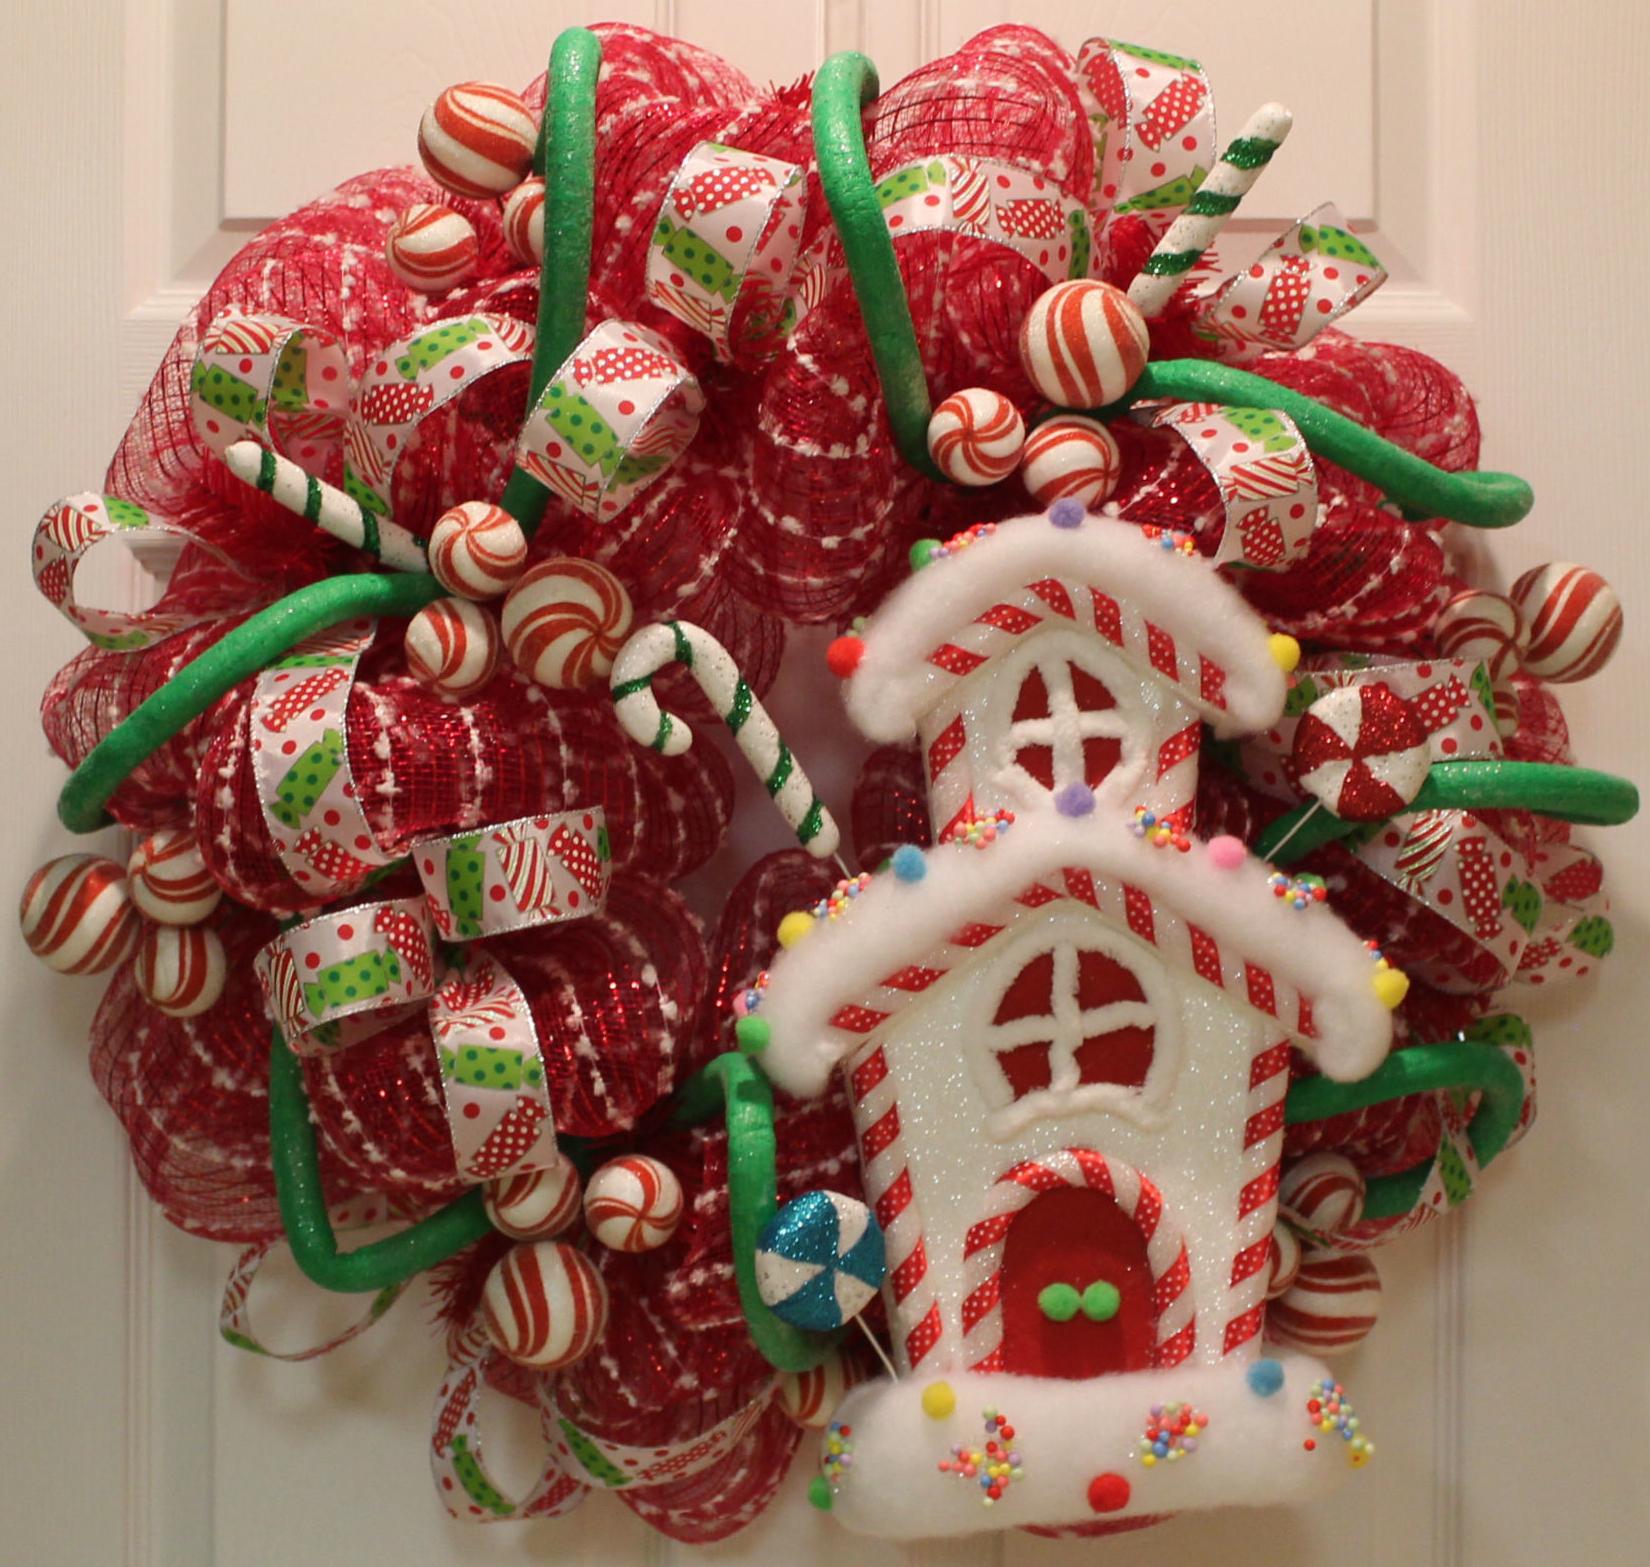 DIY Mesh Holiday Wreath Tutorial Candyland The Wreath